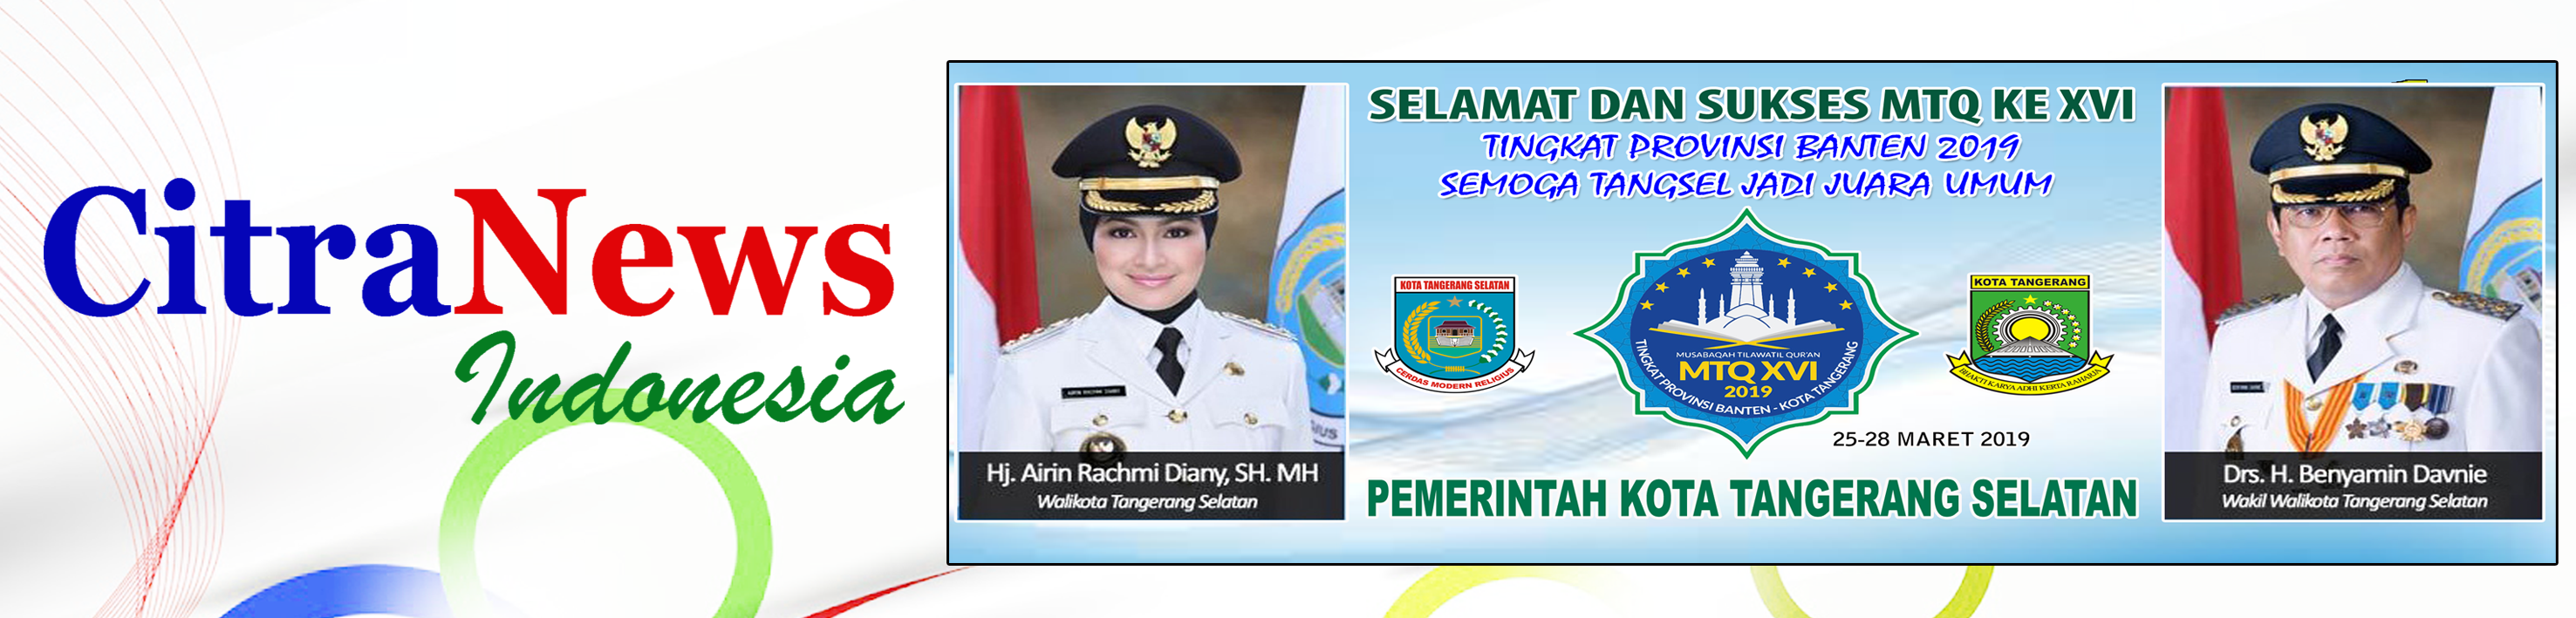 CITRANEWS INDONESIA